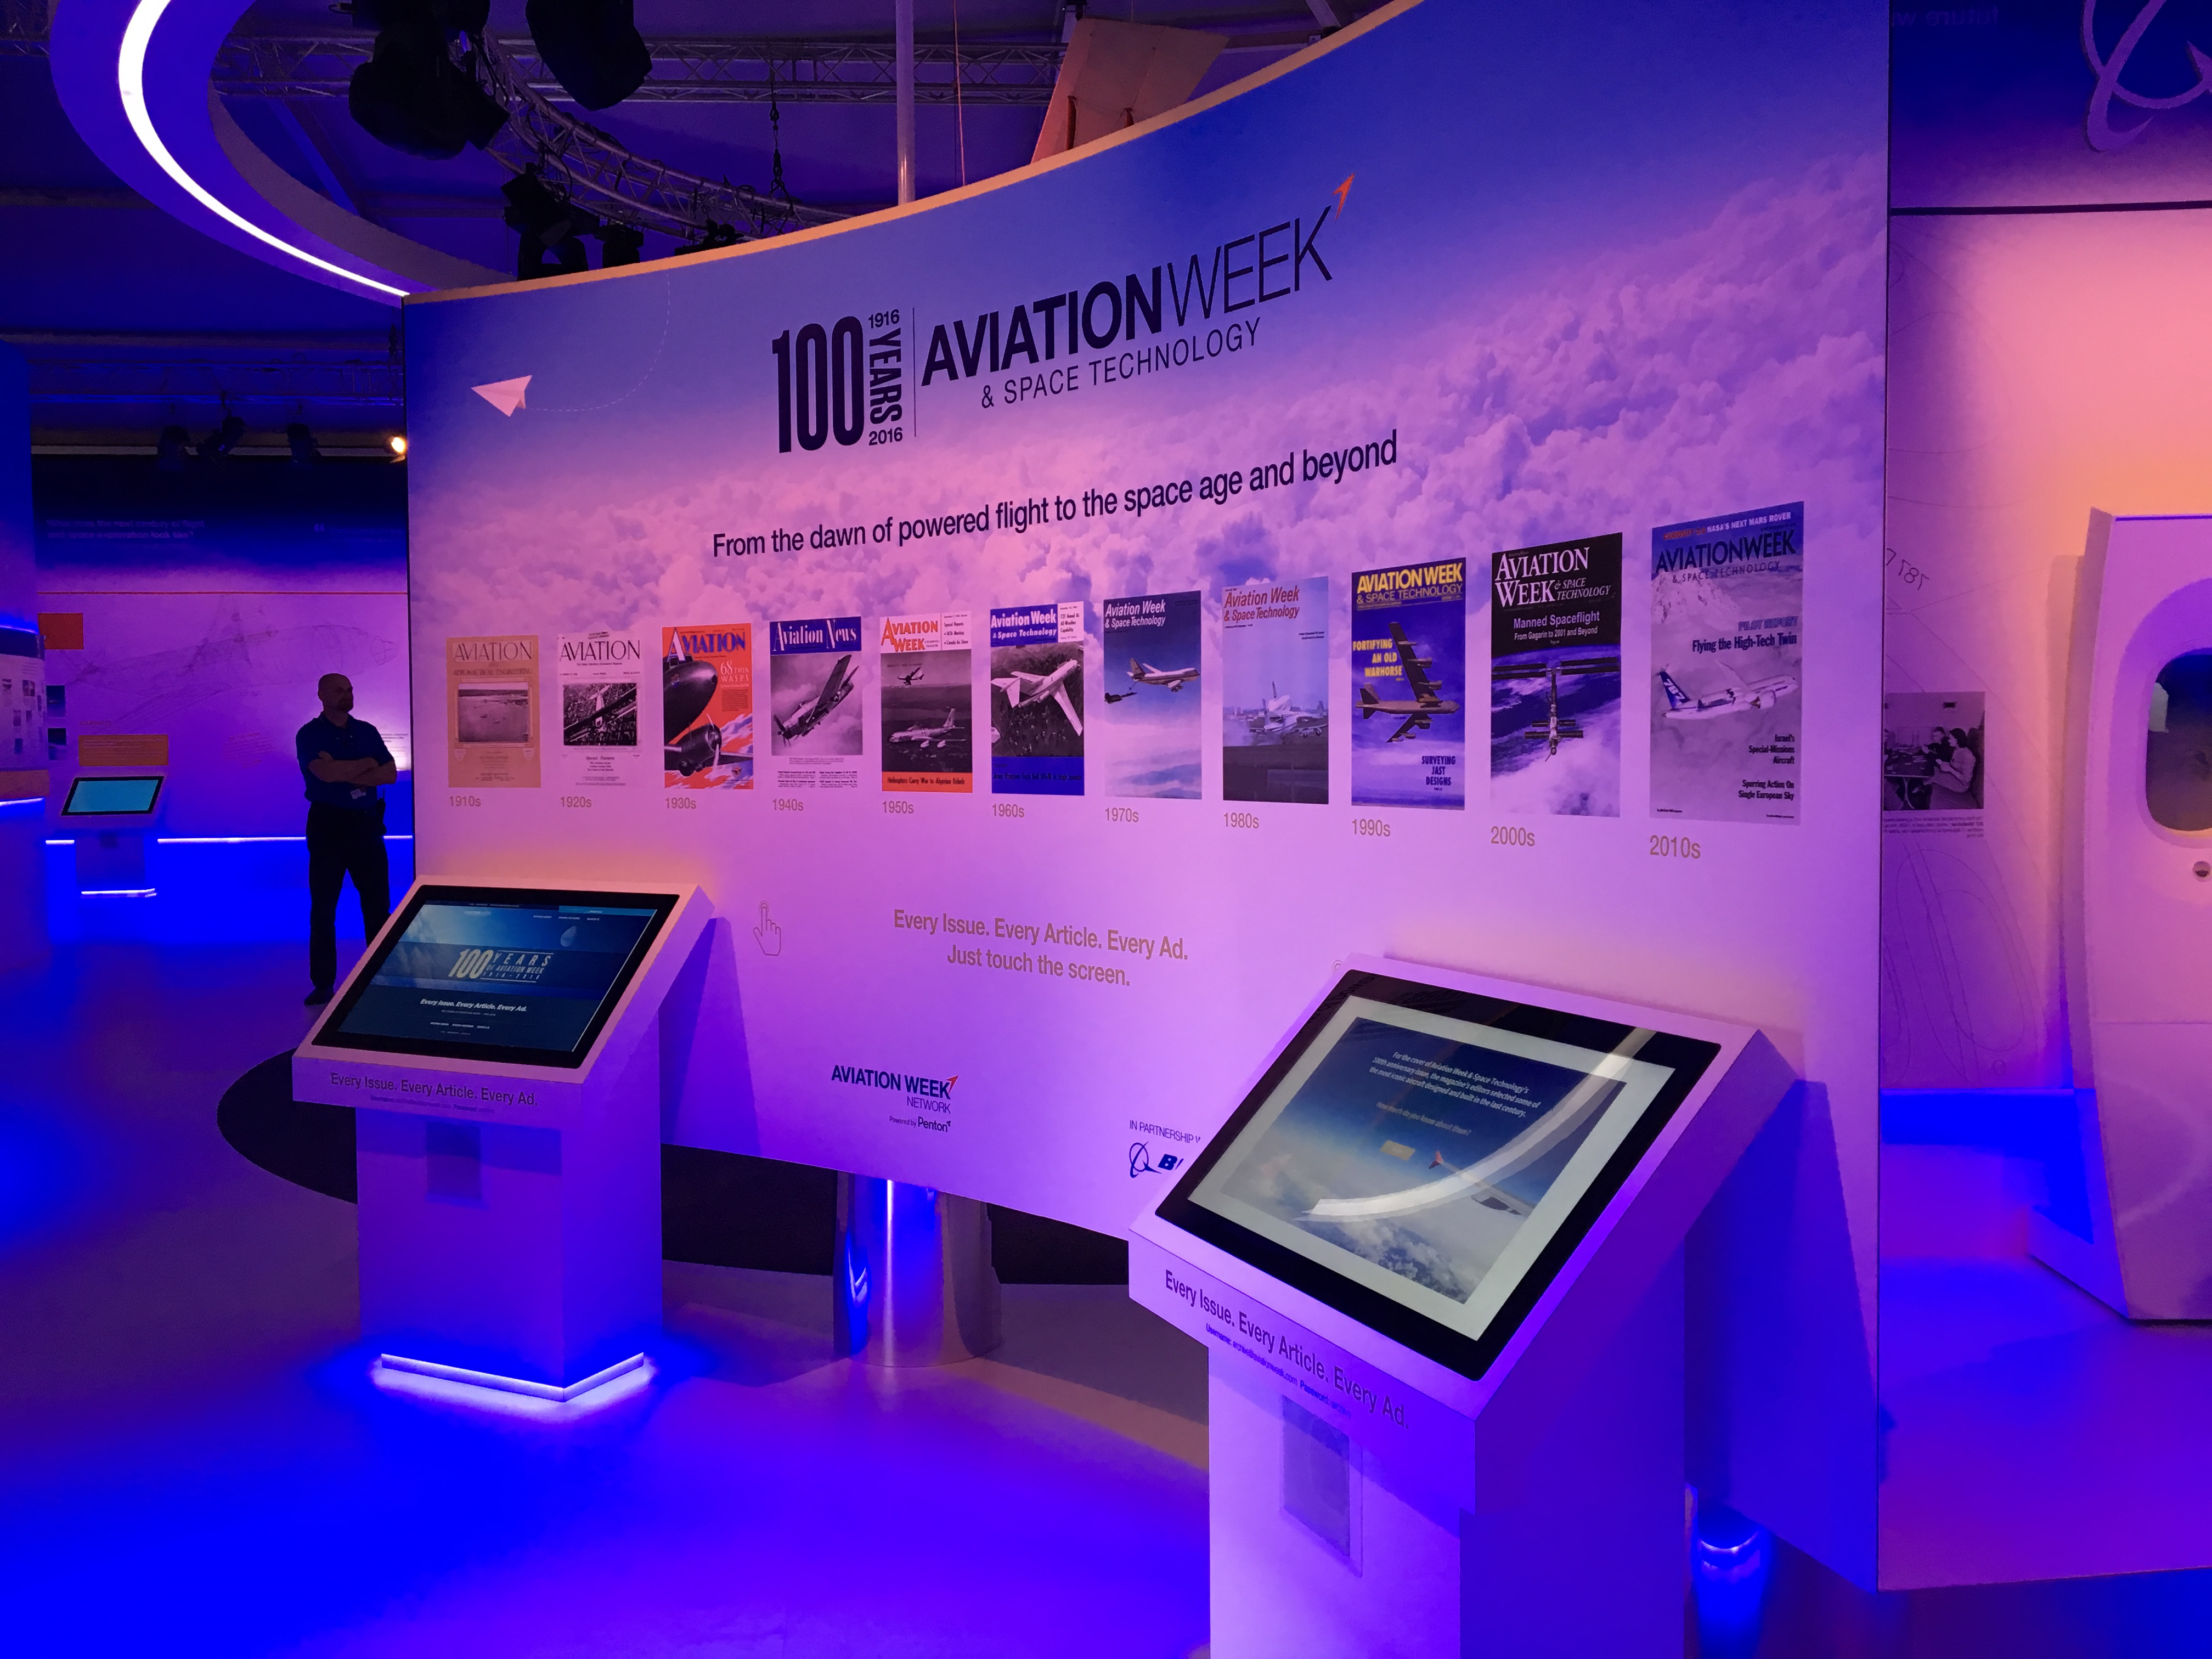 Boeing interactive kiosk